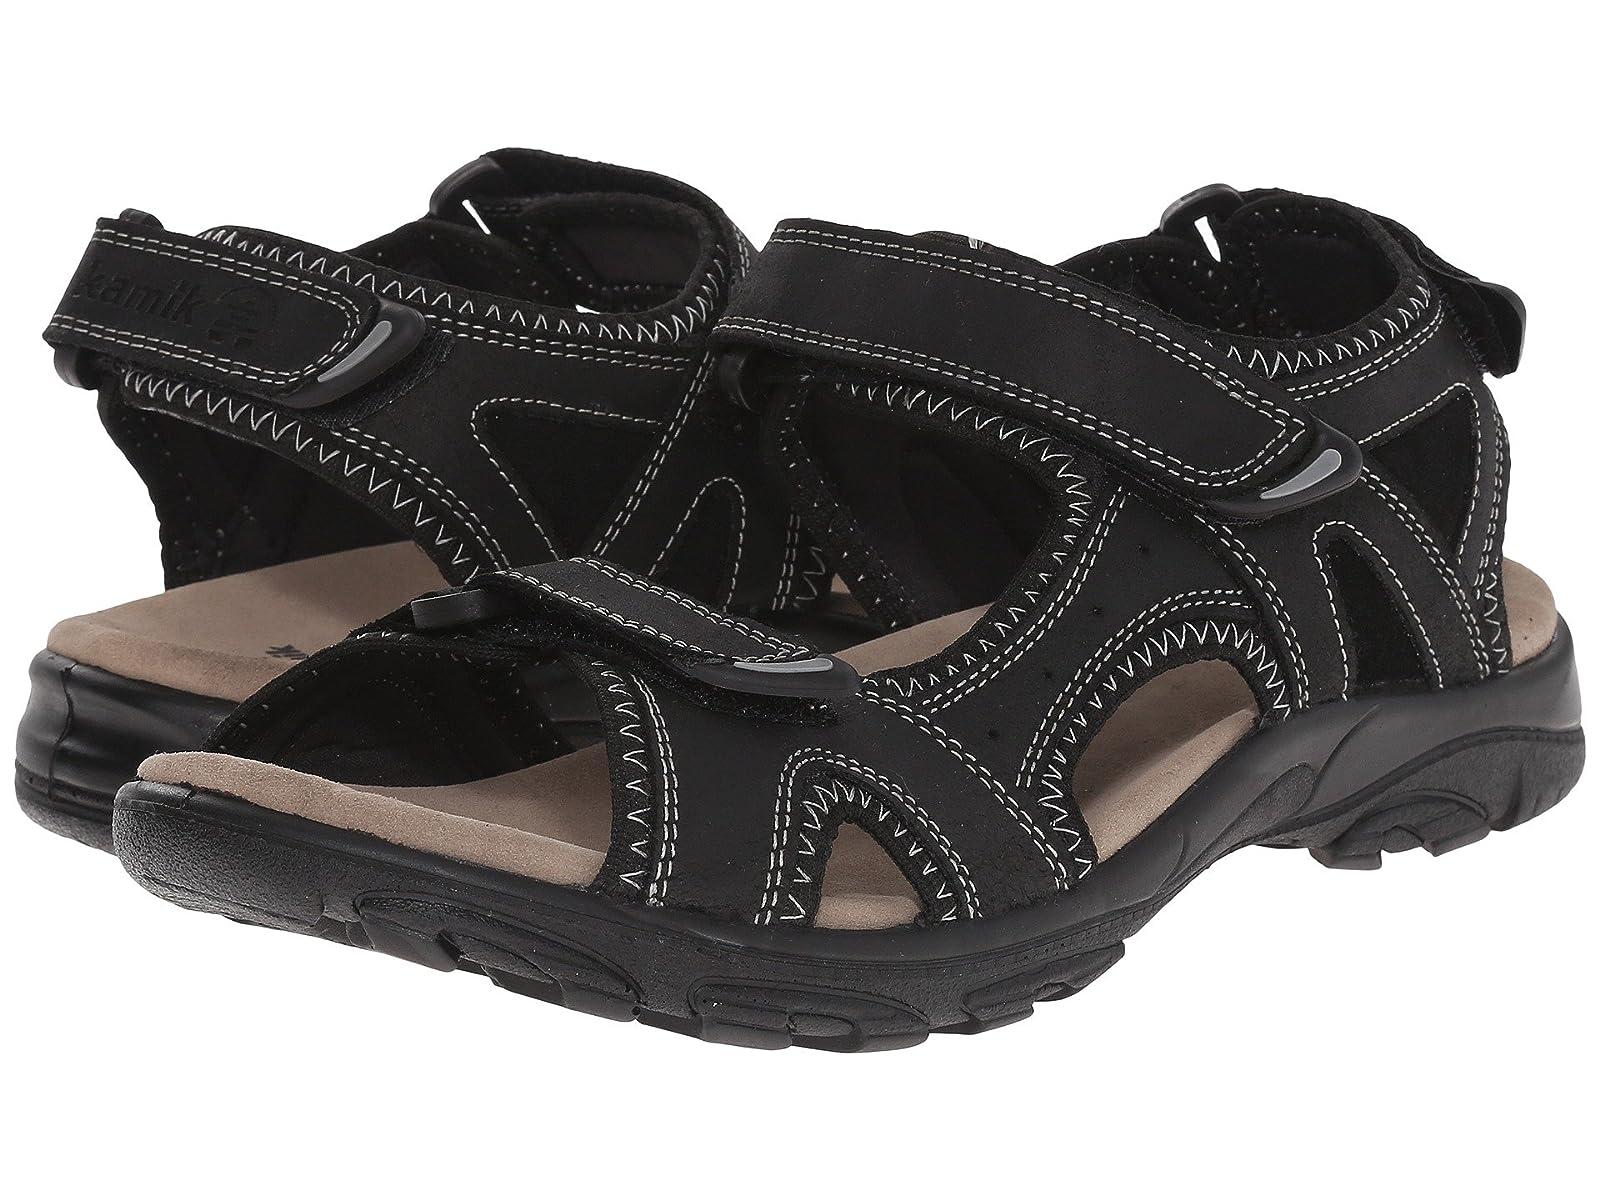 Kamik PierAtmospheric grades have affordable shoes